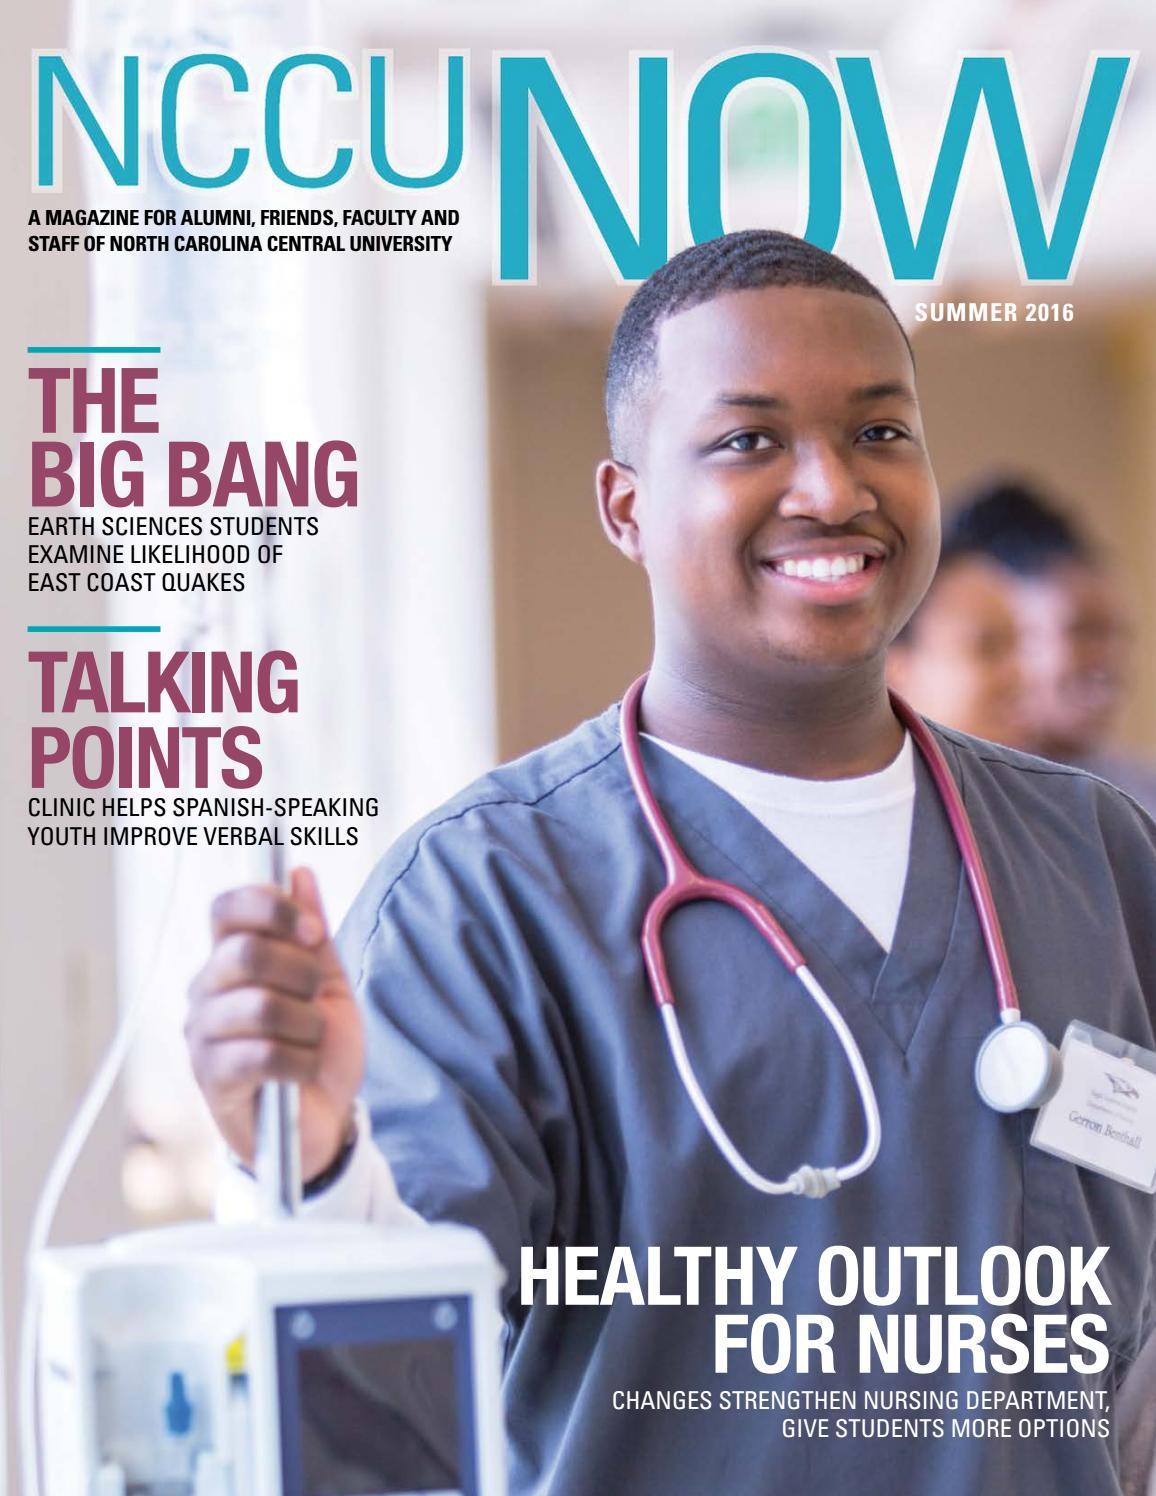 NCCU Now - Summer 2016